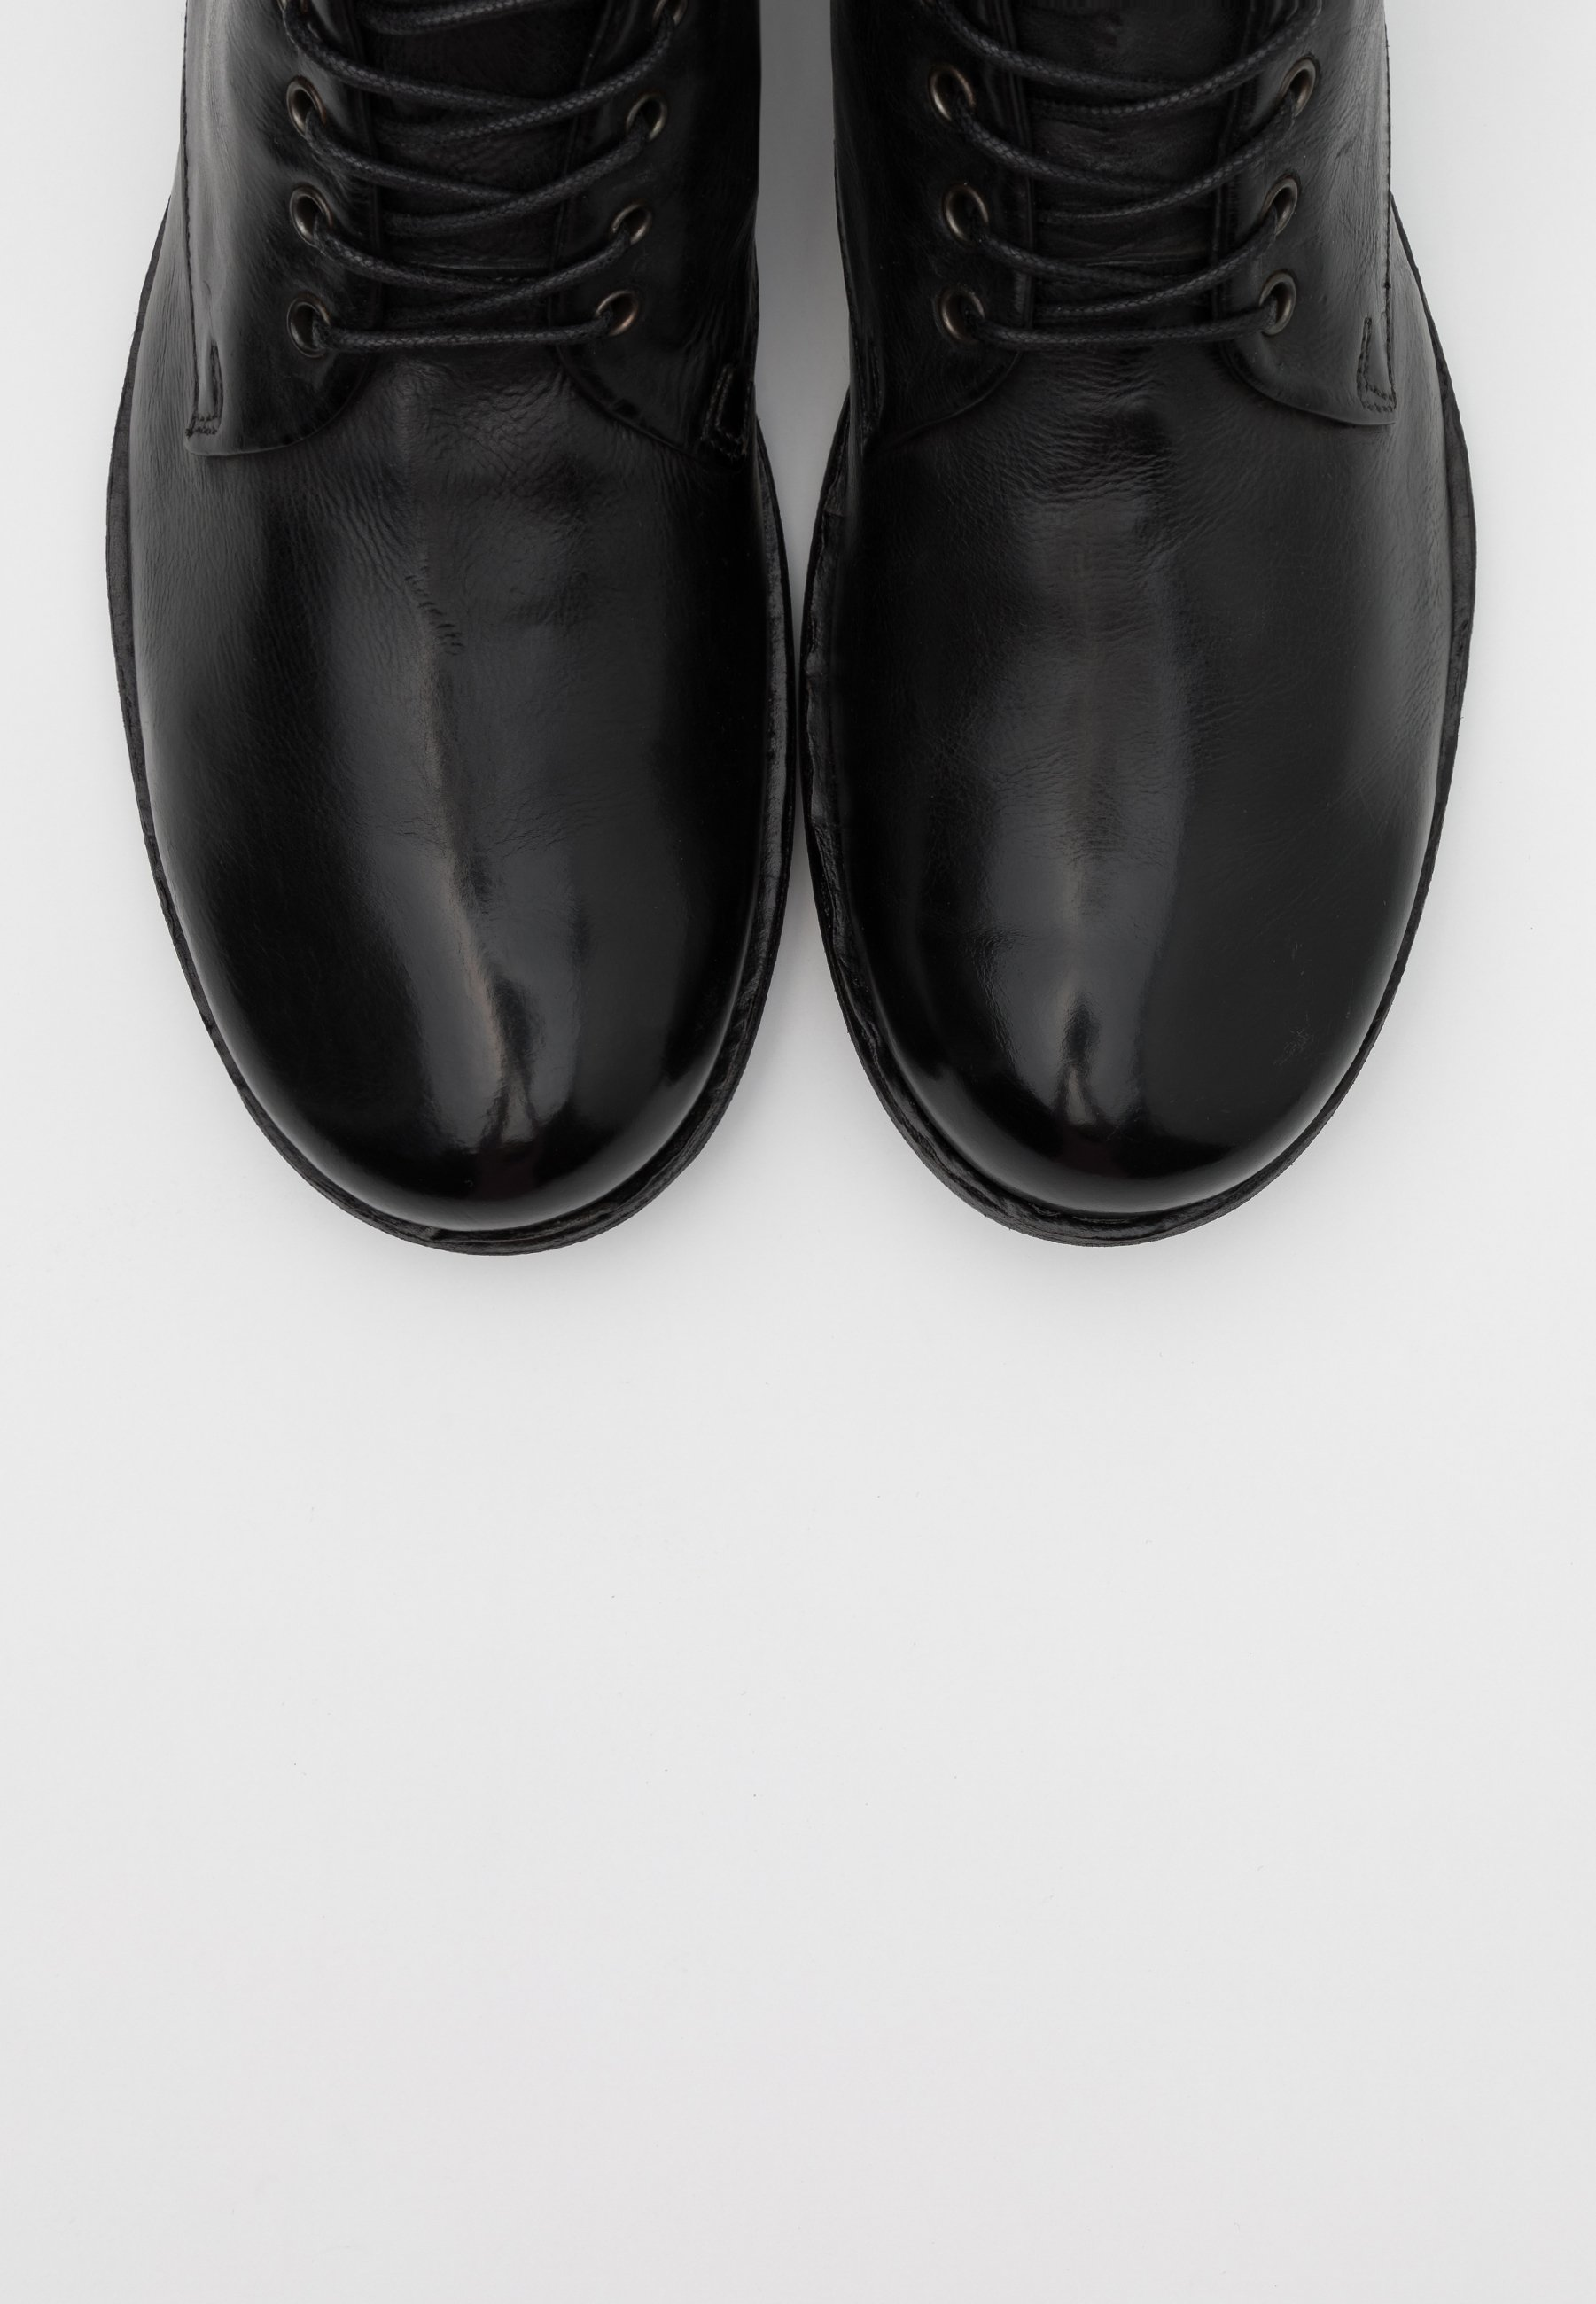 A.s.98 Tintonkapo - Korte Laarzen Nero Goedkope Schoenen